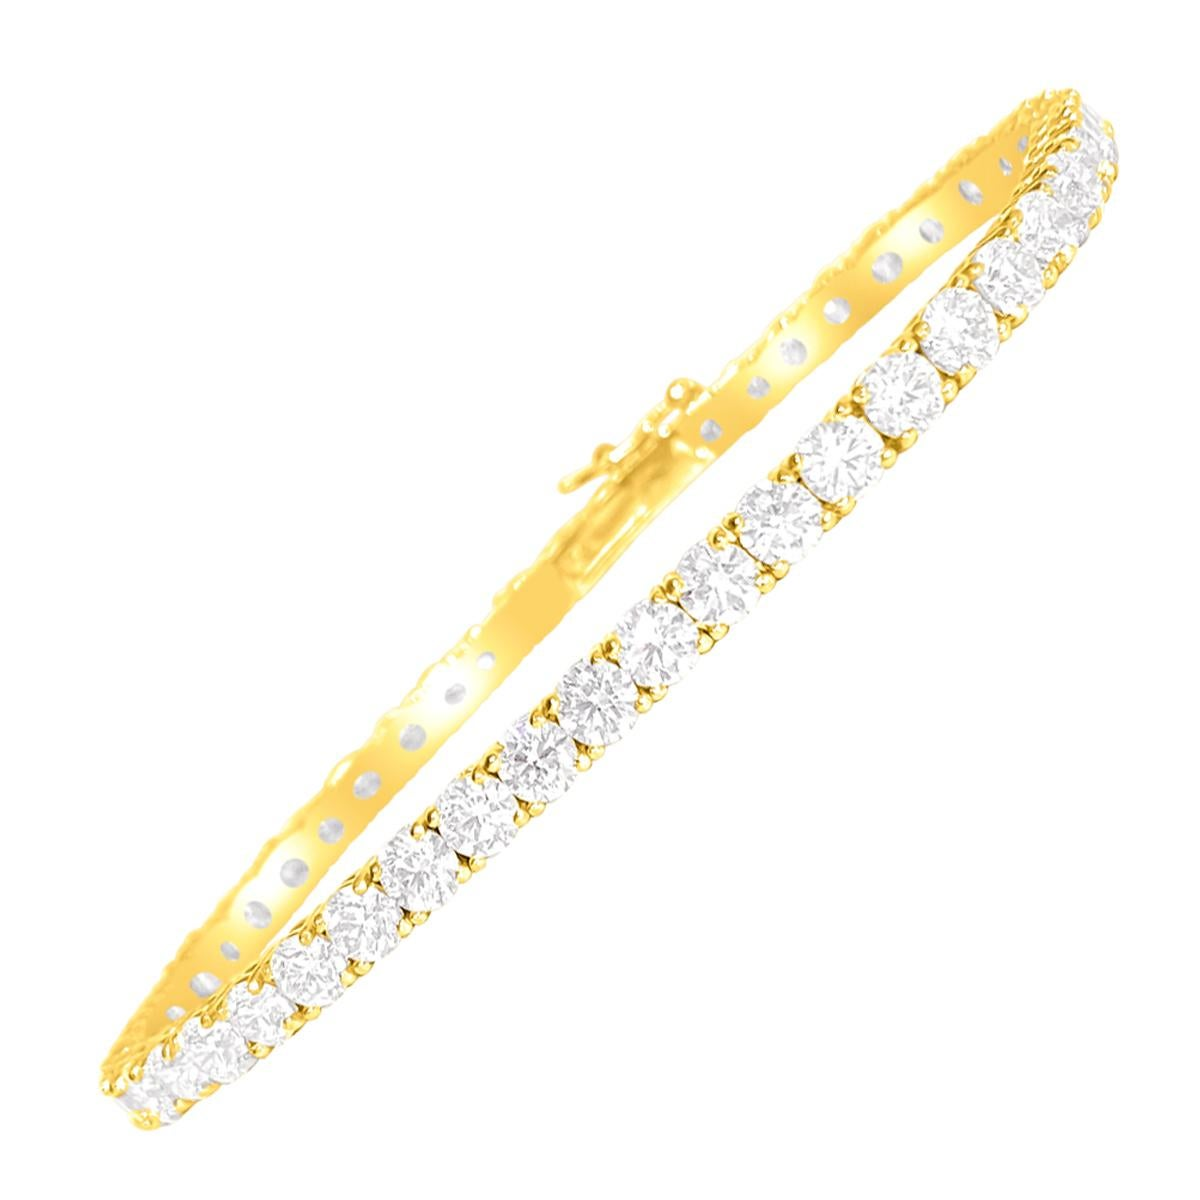 Custom Made 9.10 Carat VVS Diamond Tennis Bracelet 14 Karat Yellow Gold